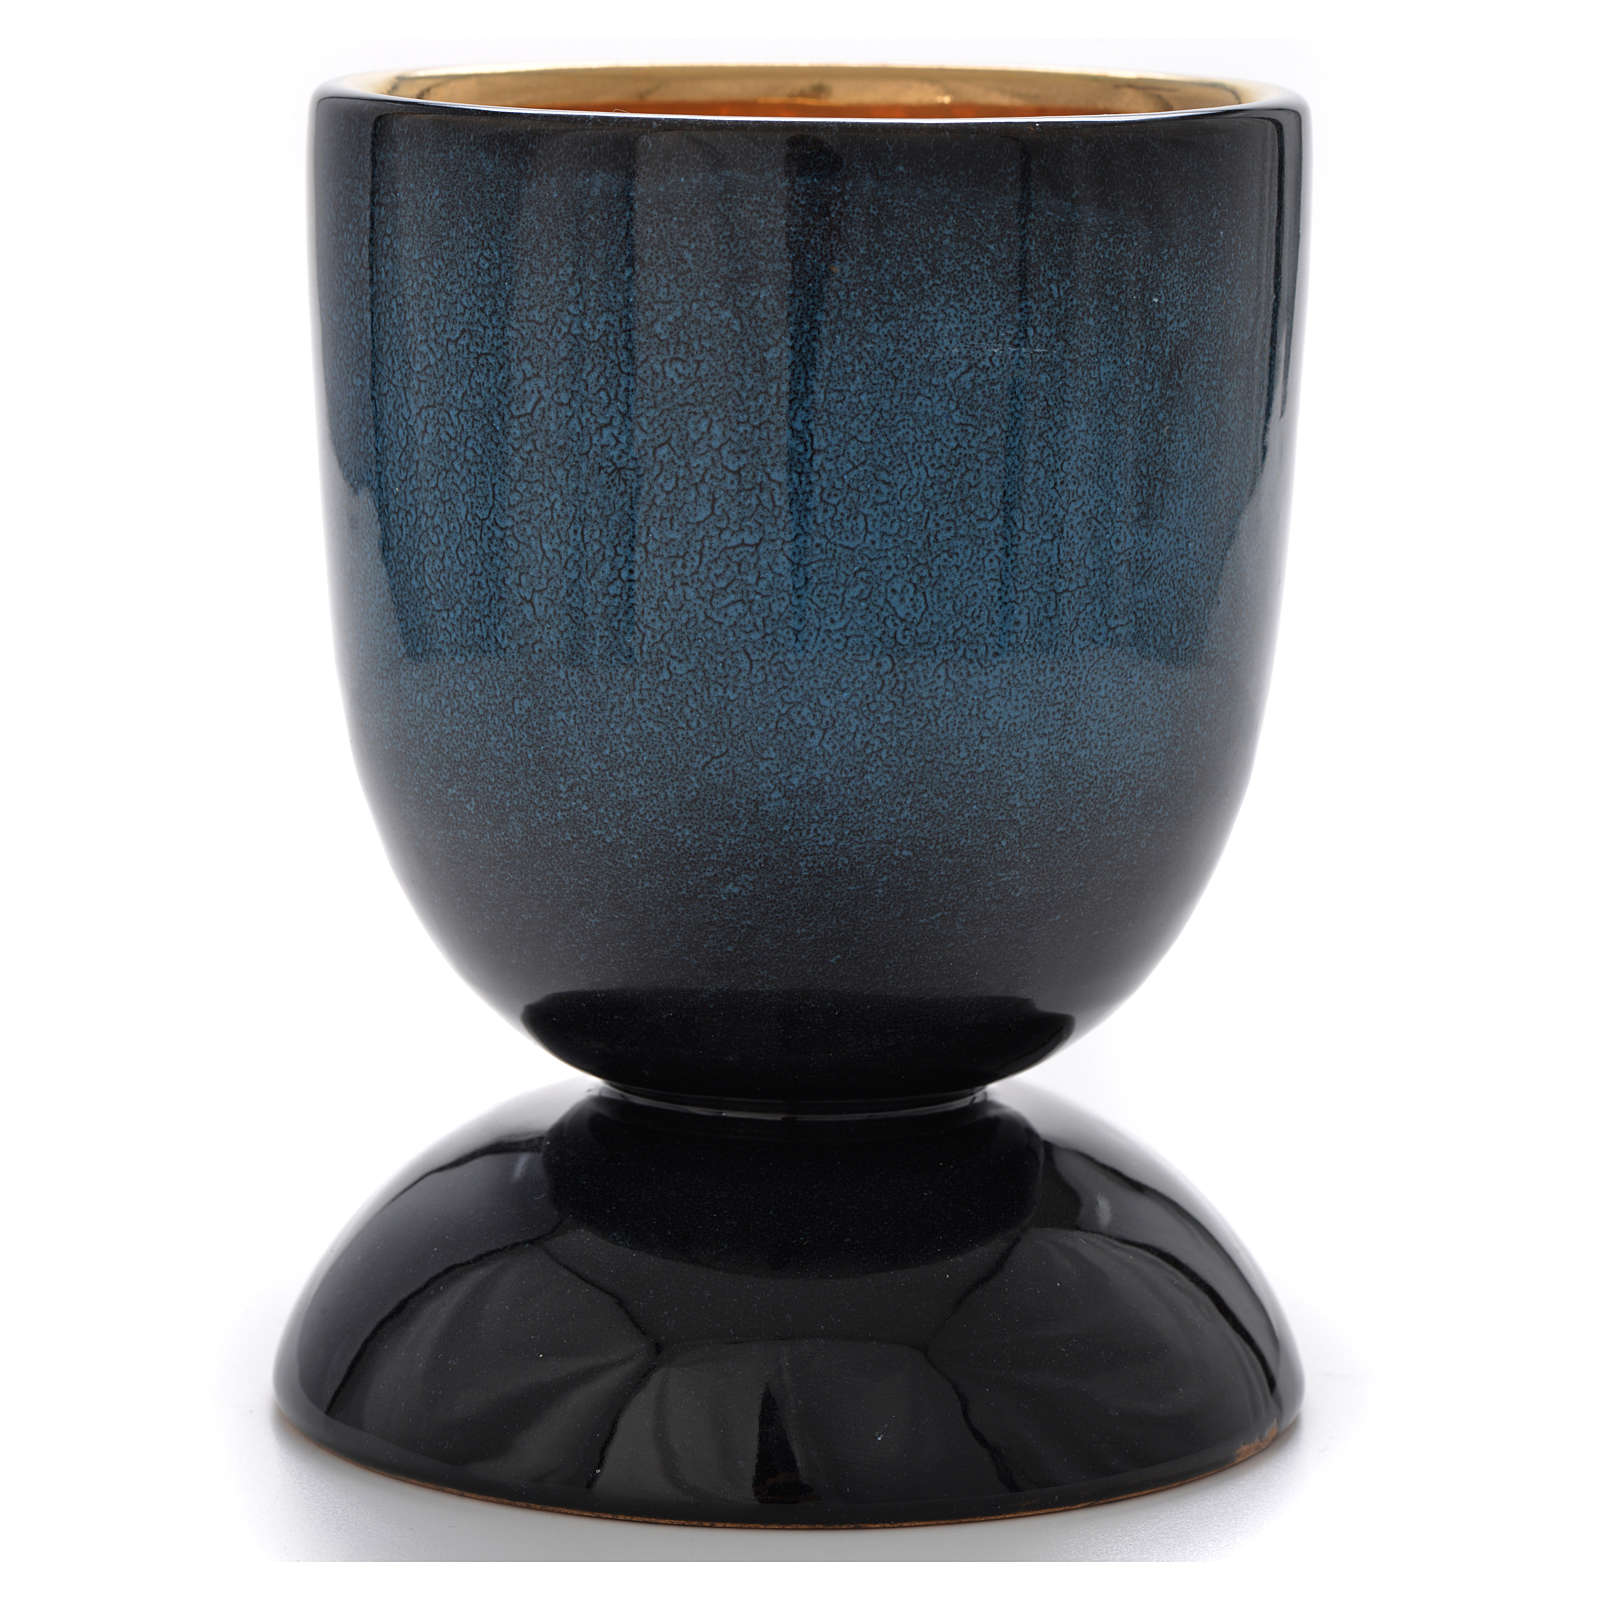 Cáliz ceramica azul pan y pezes interior oro 4